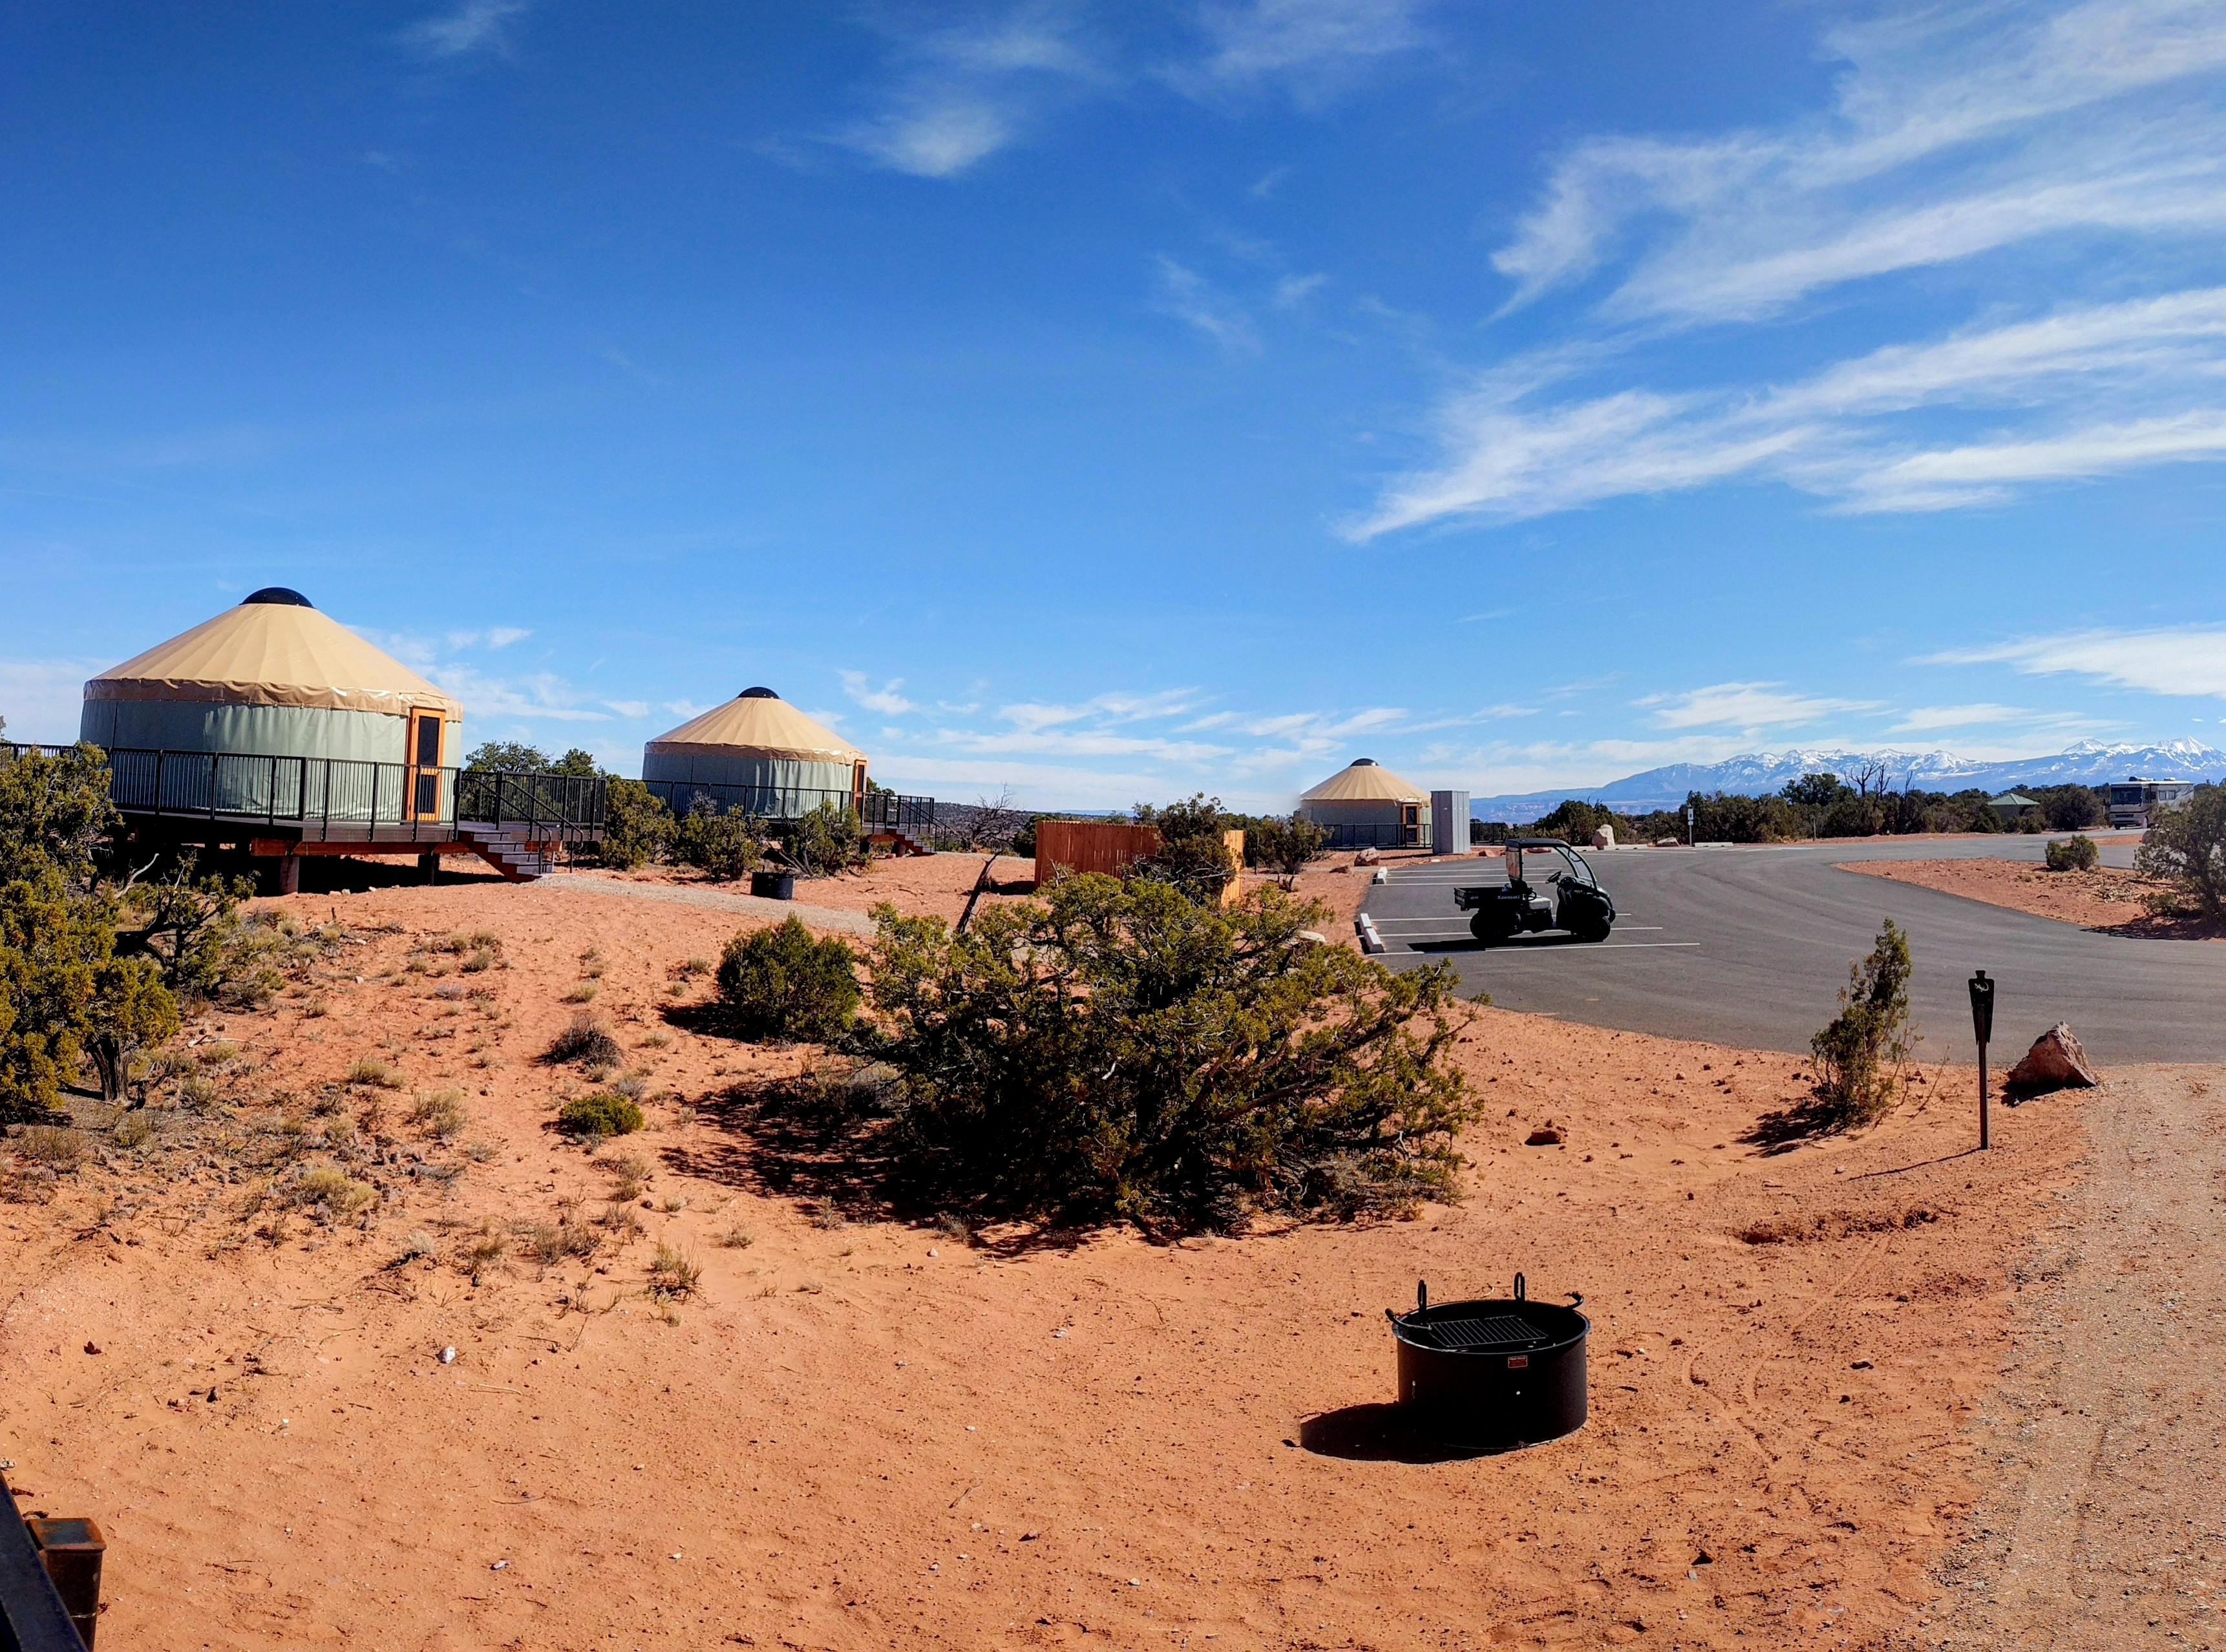 Wingate Yurts Utah State Parks